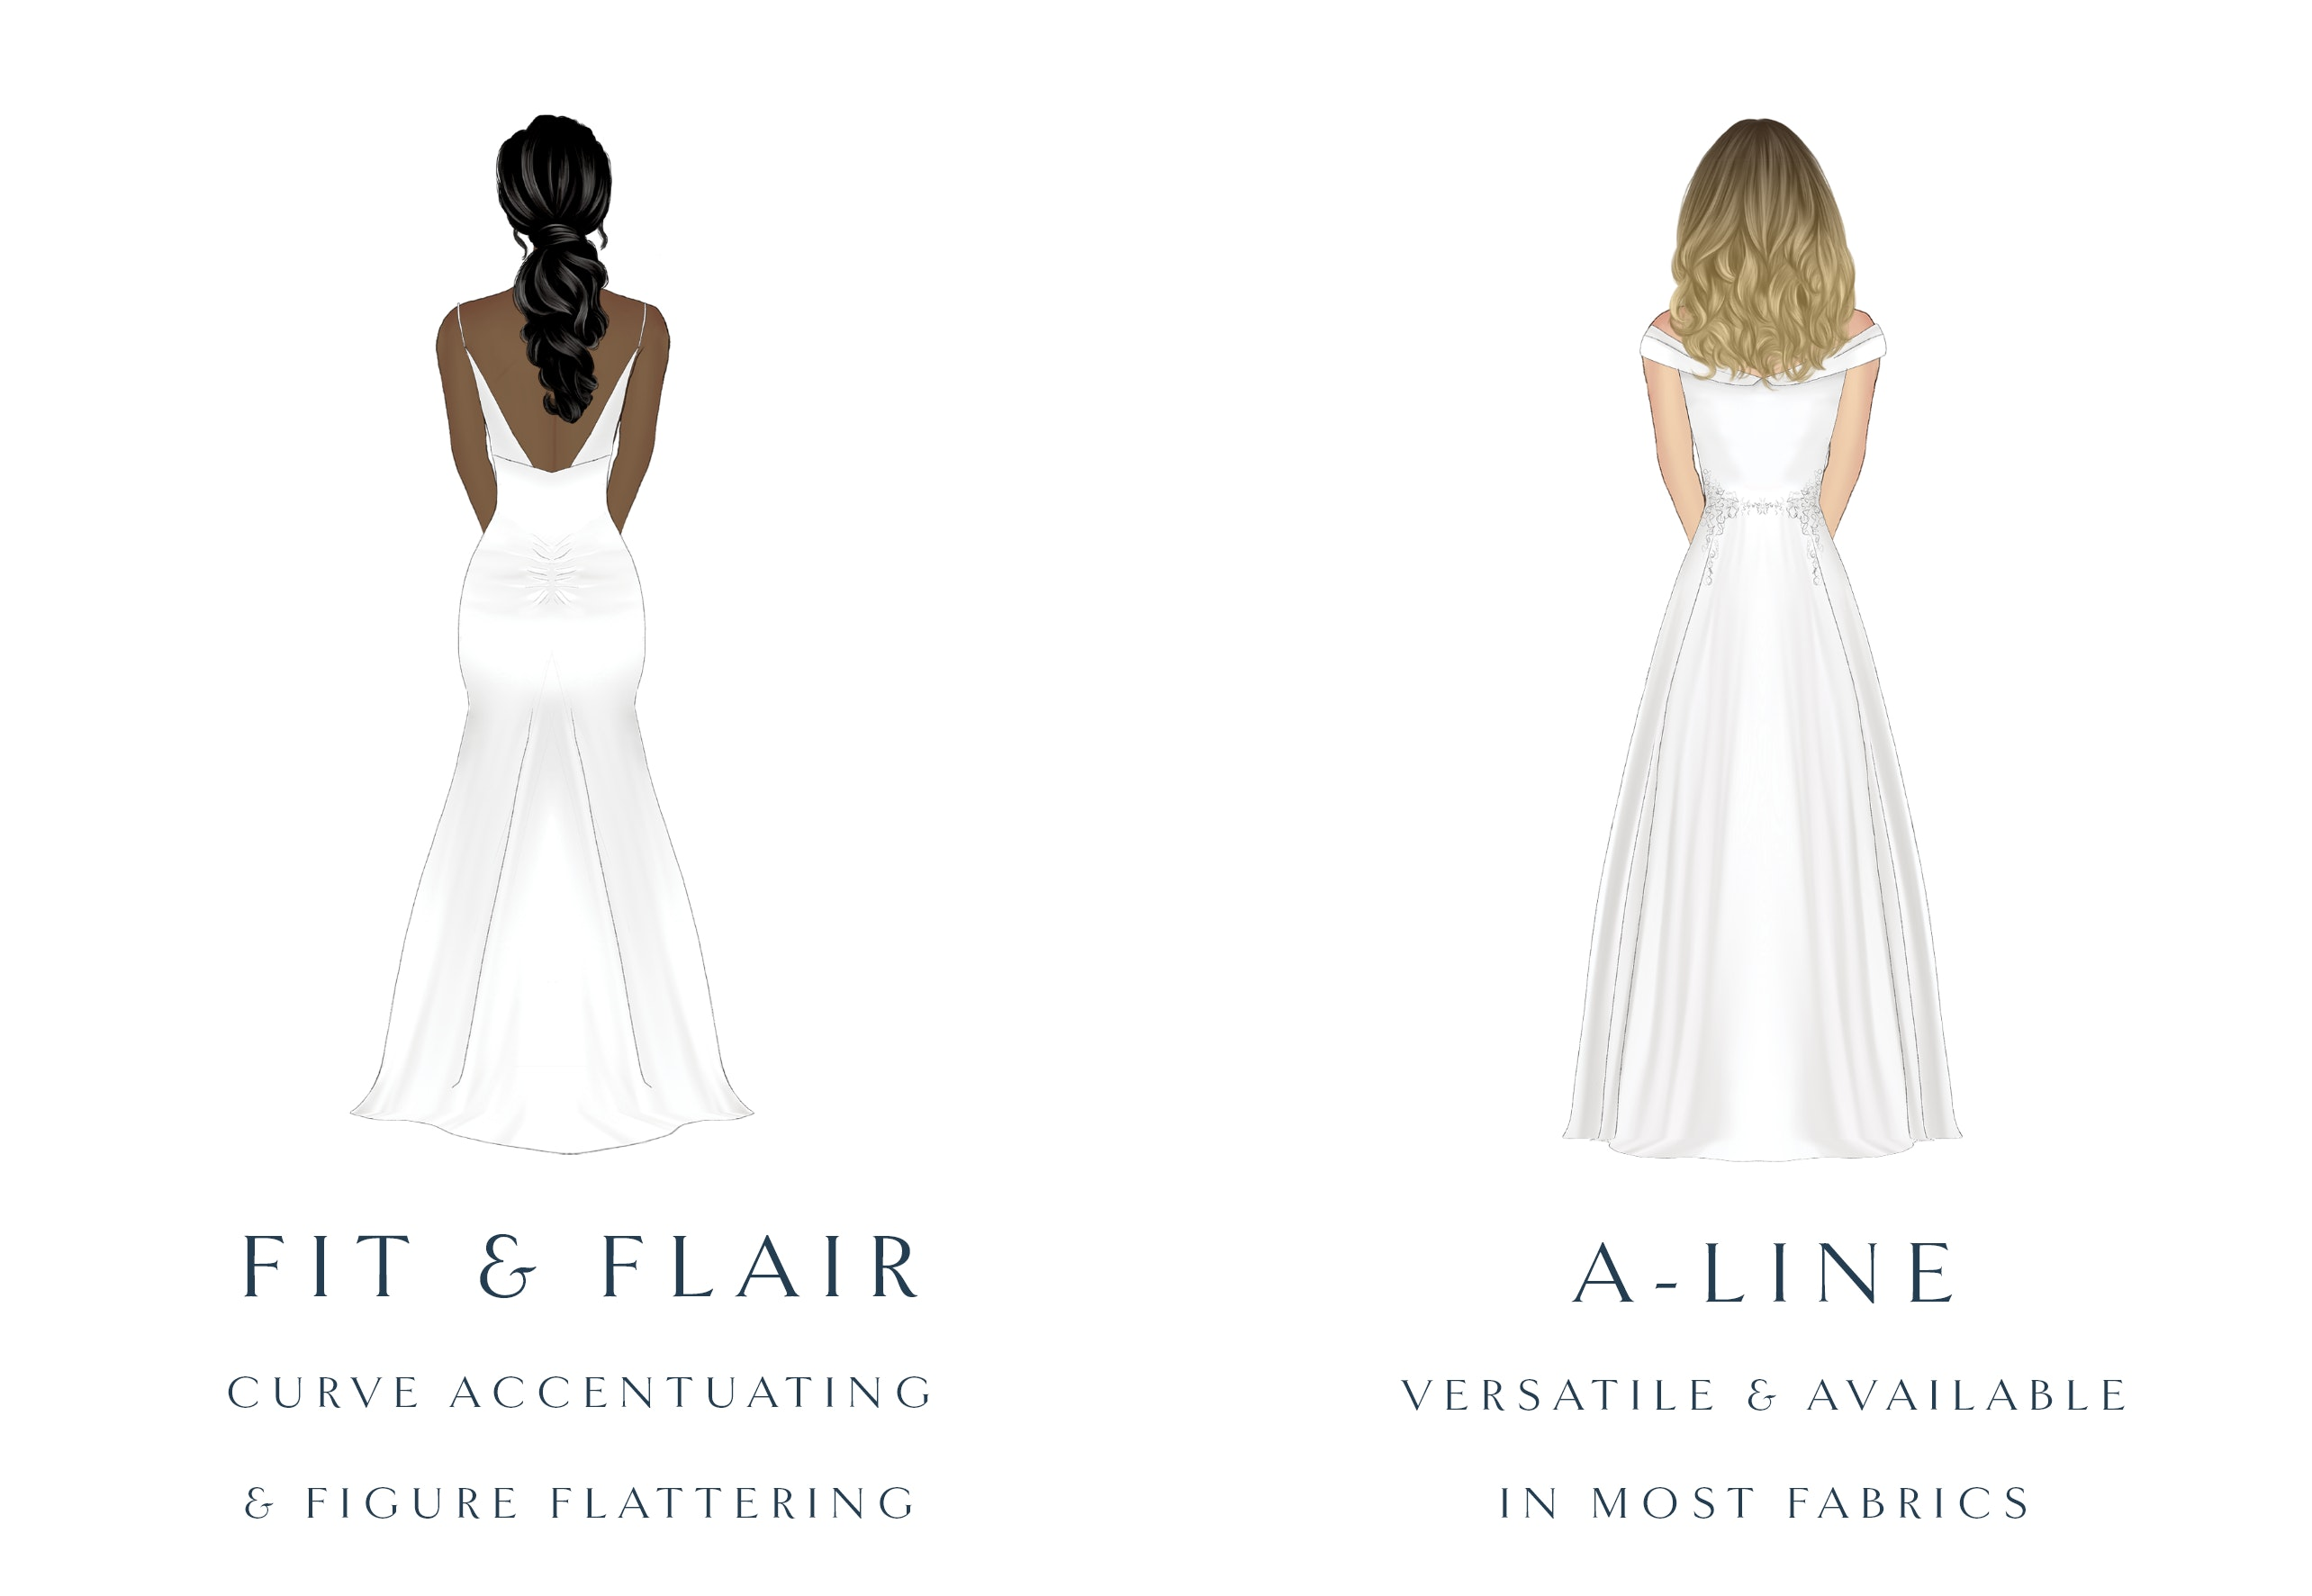 drop waist and mermaid wedding dress silhouette